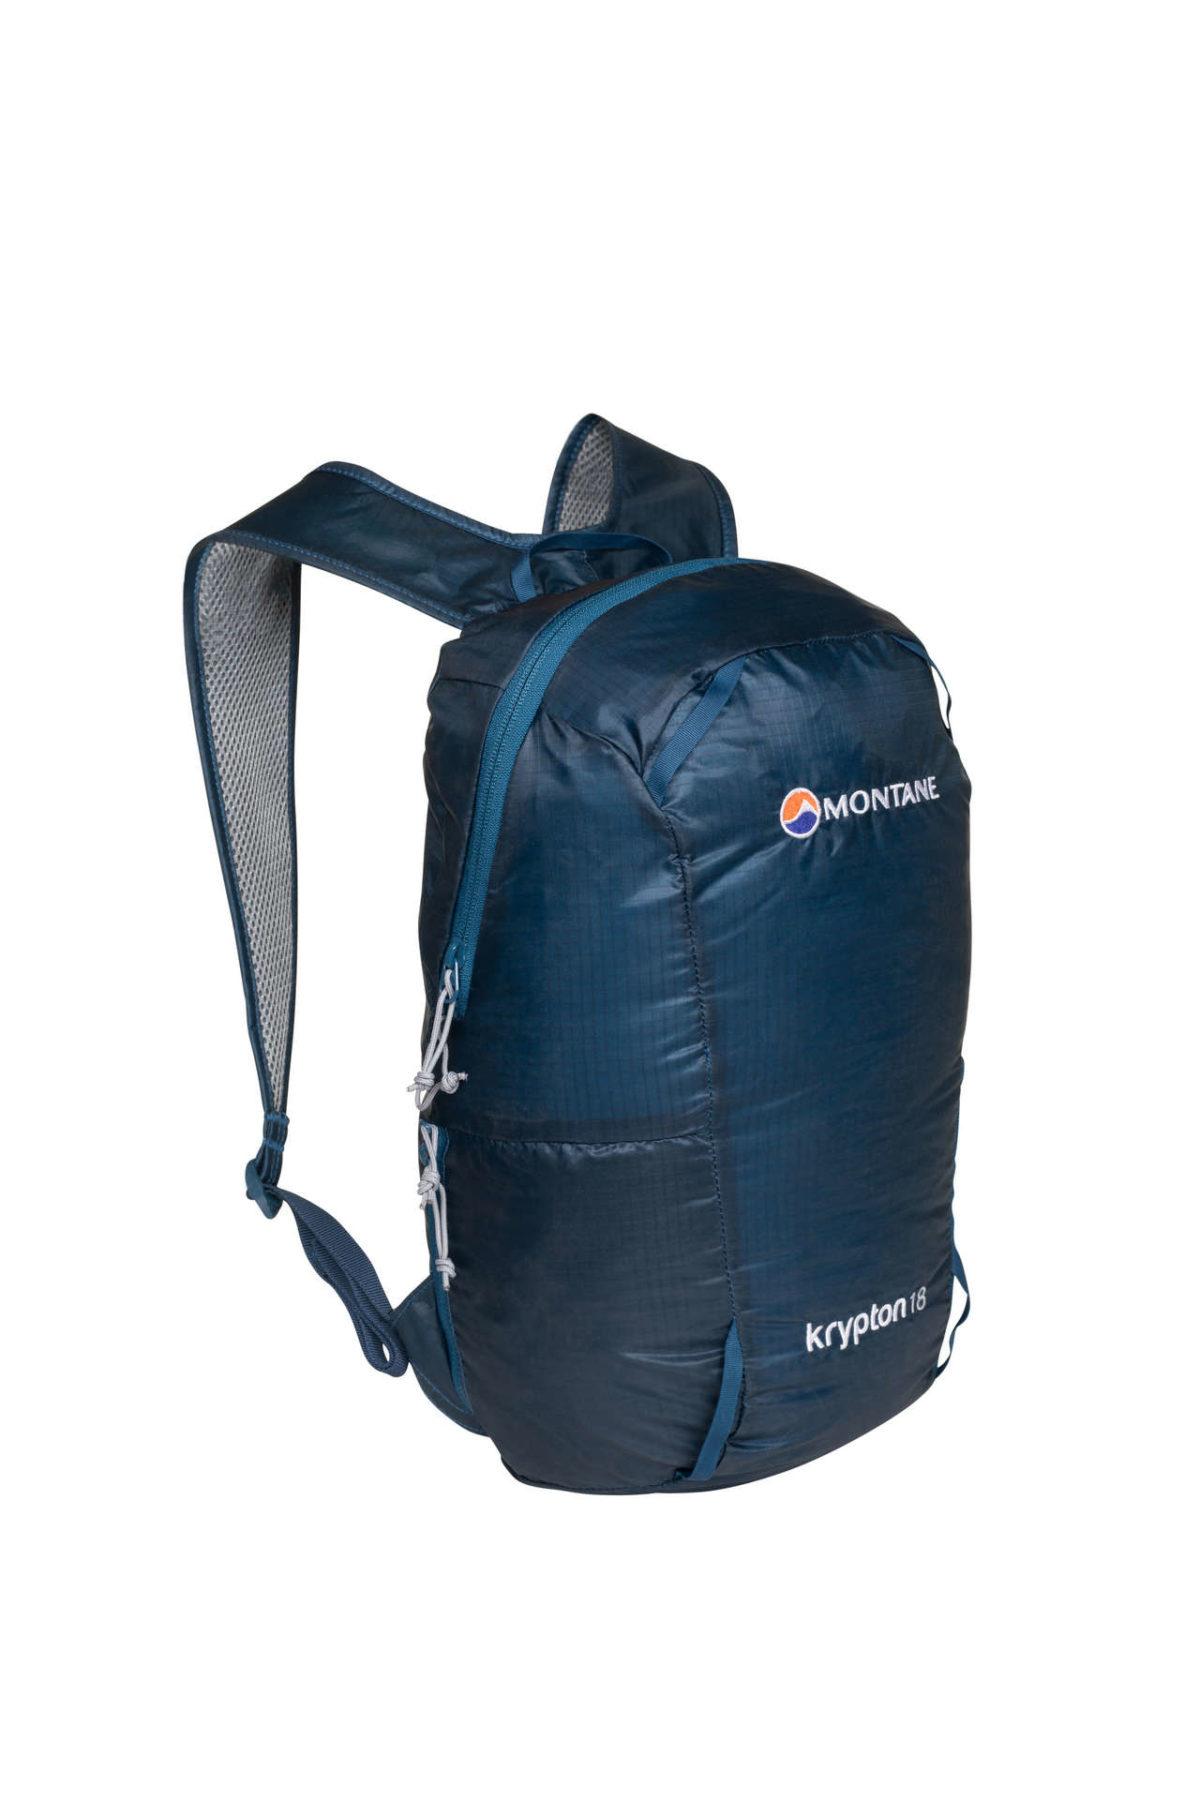 Versatile lightweight day pack